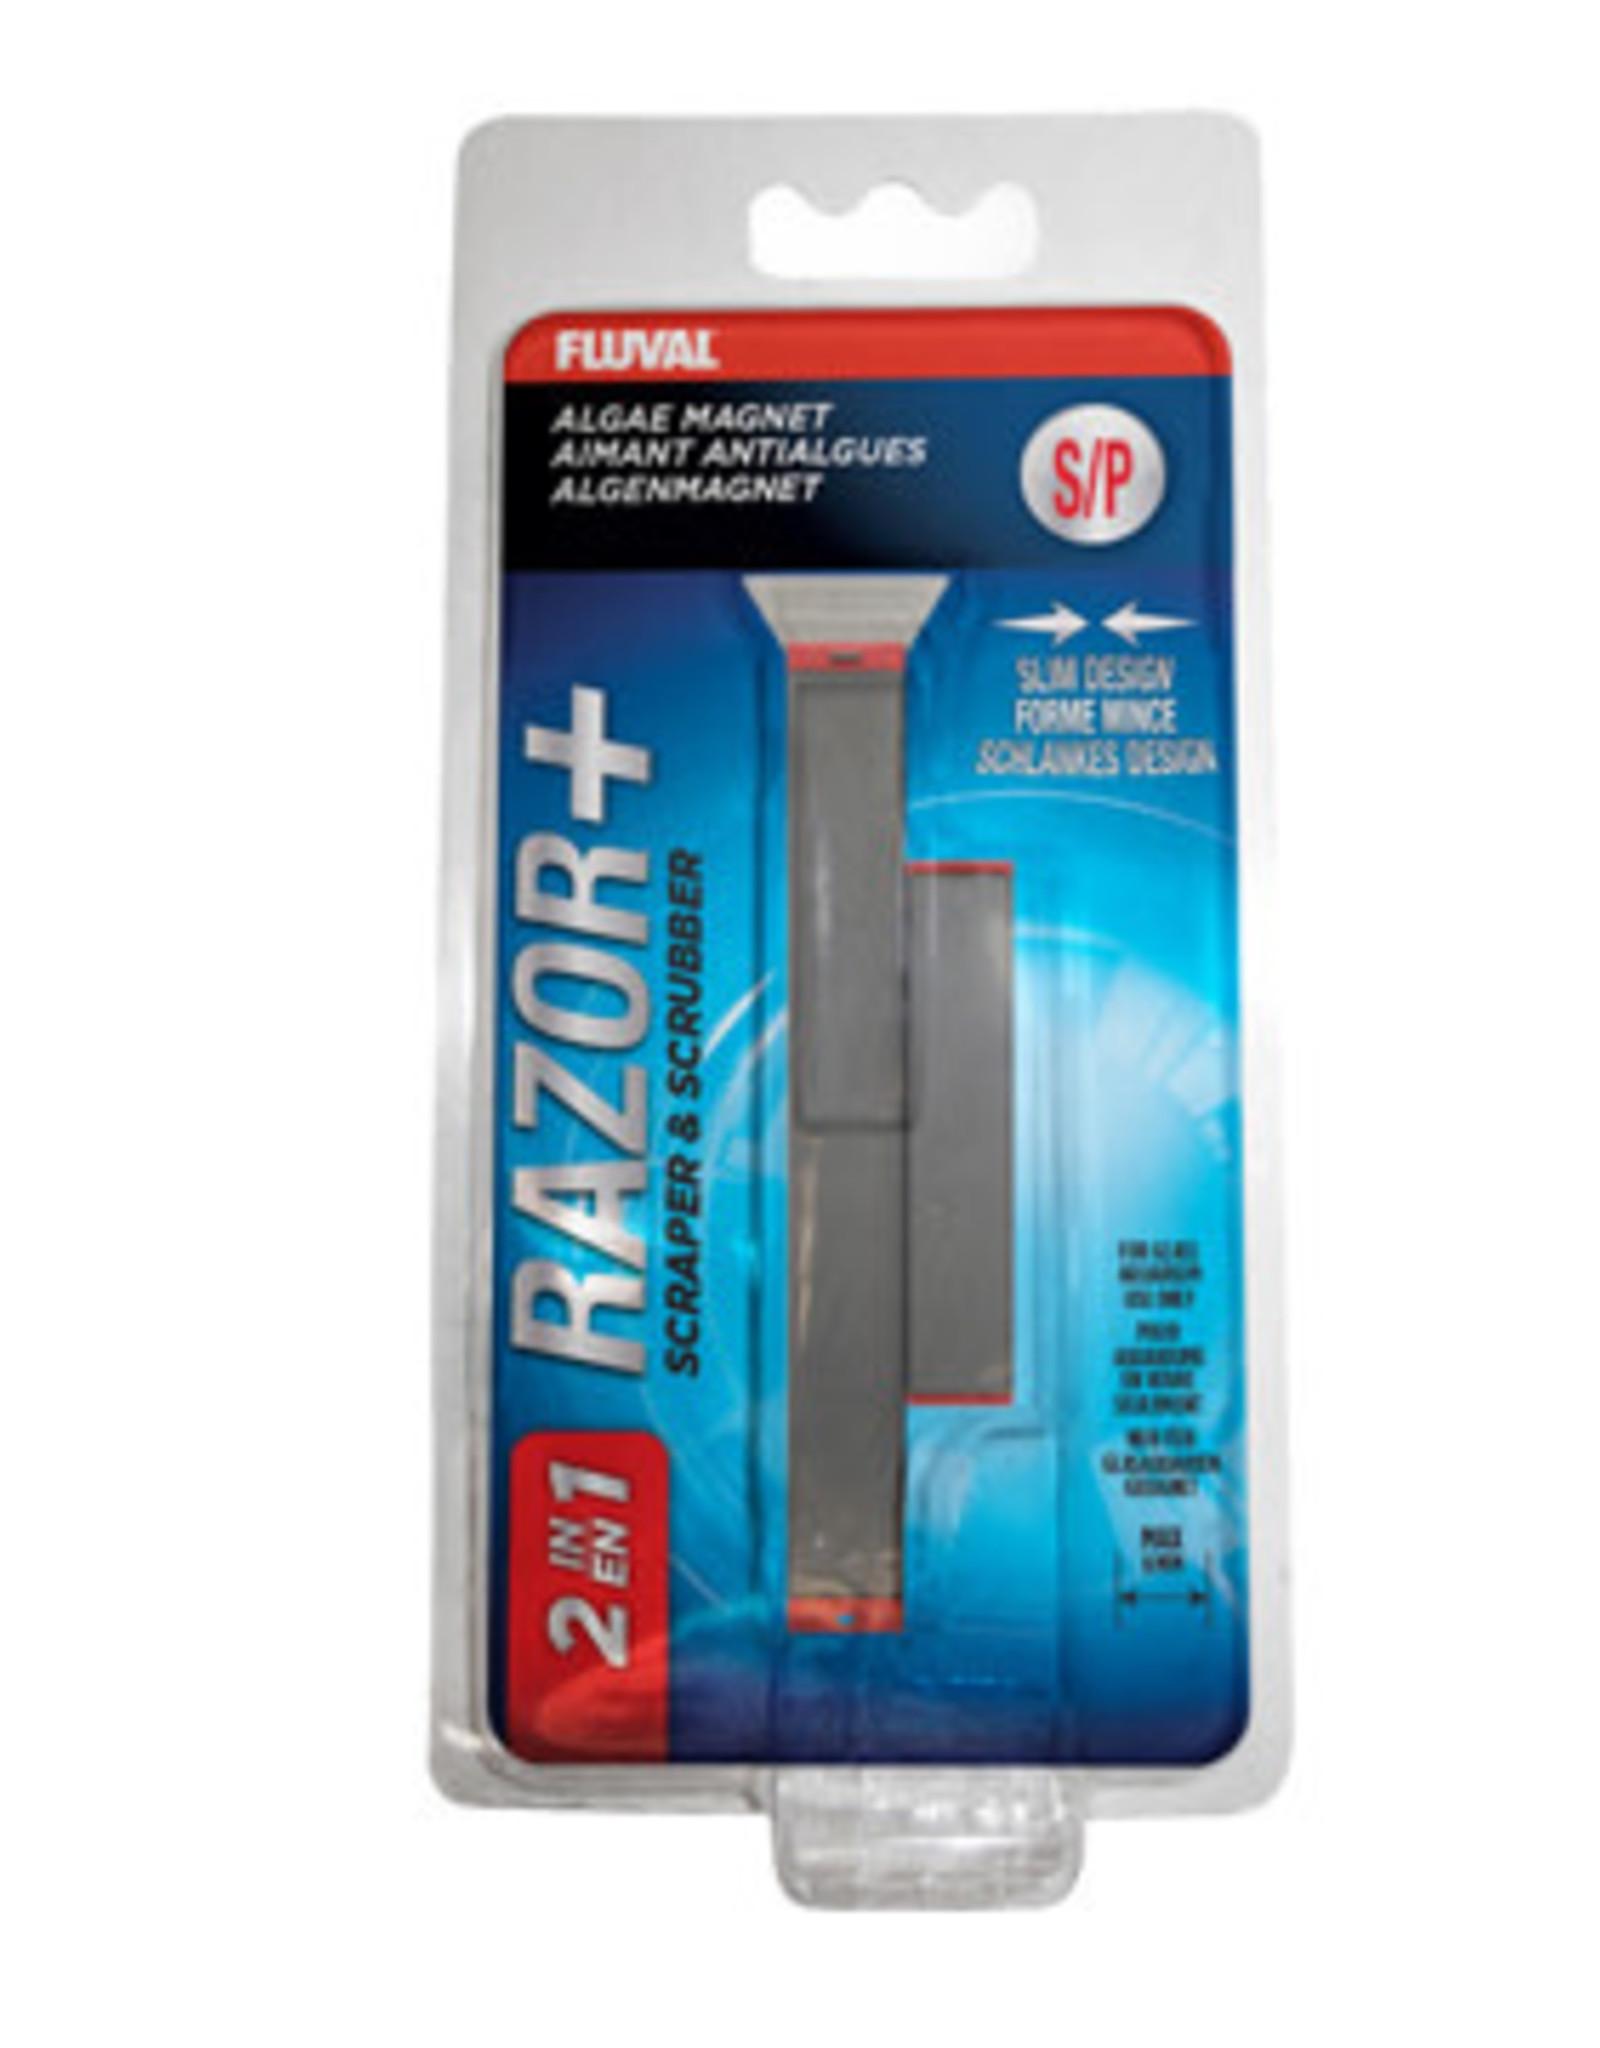 Fluval Fluval Razor+ 2-in-1 Algae Magnet - Small